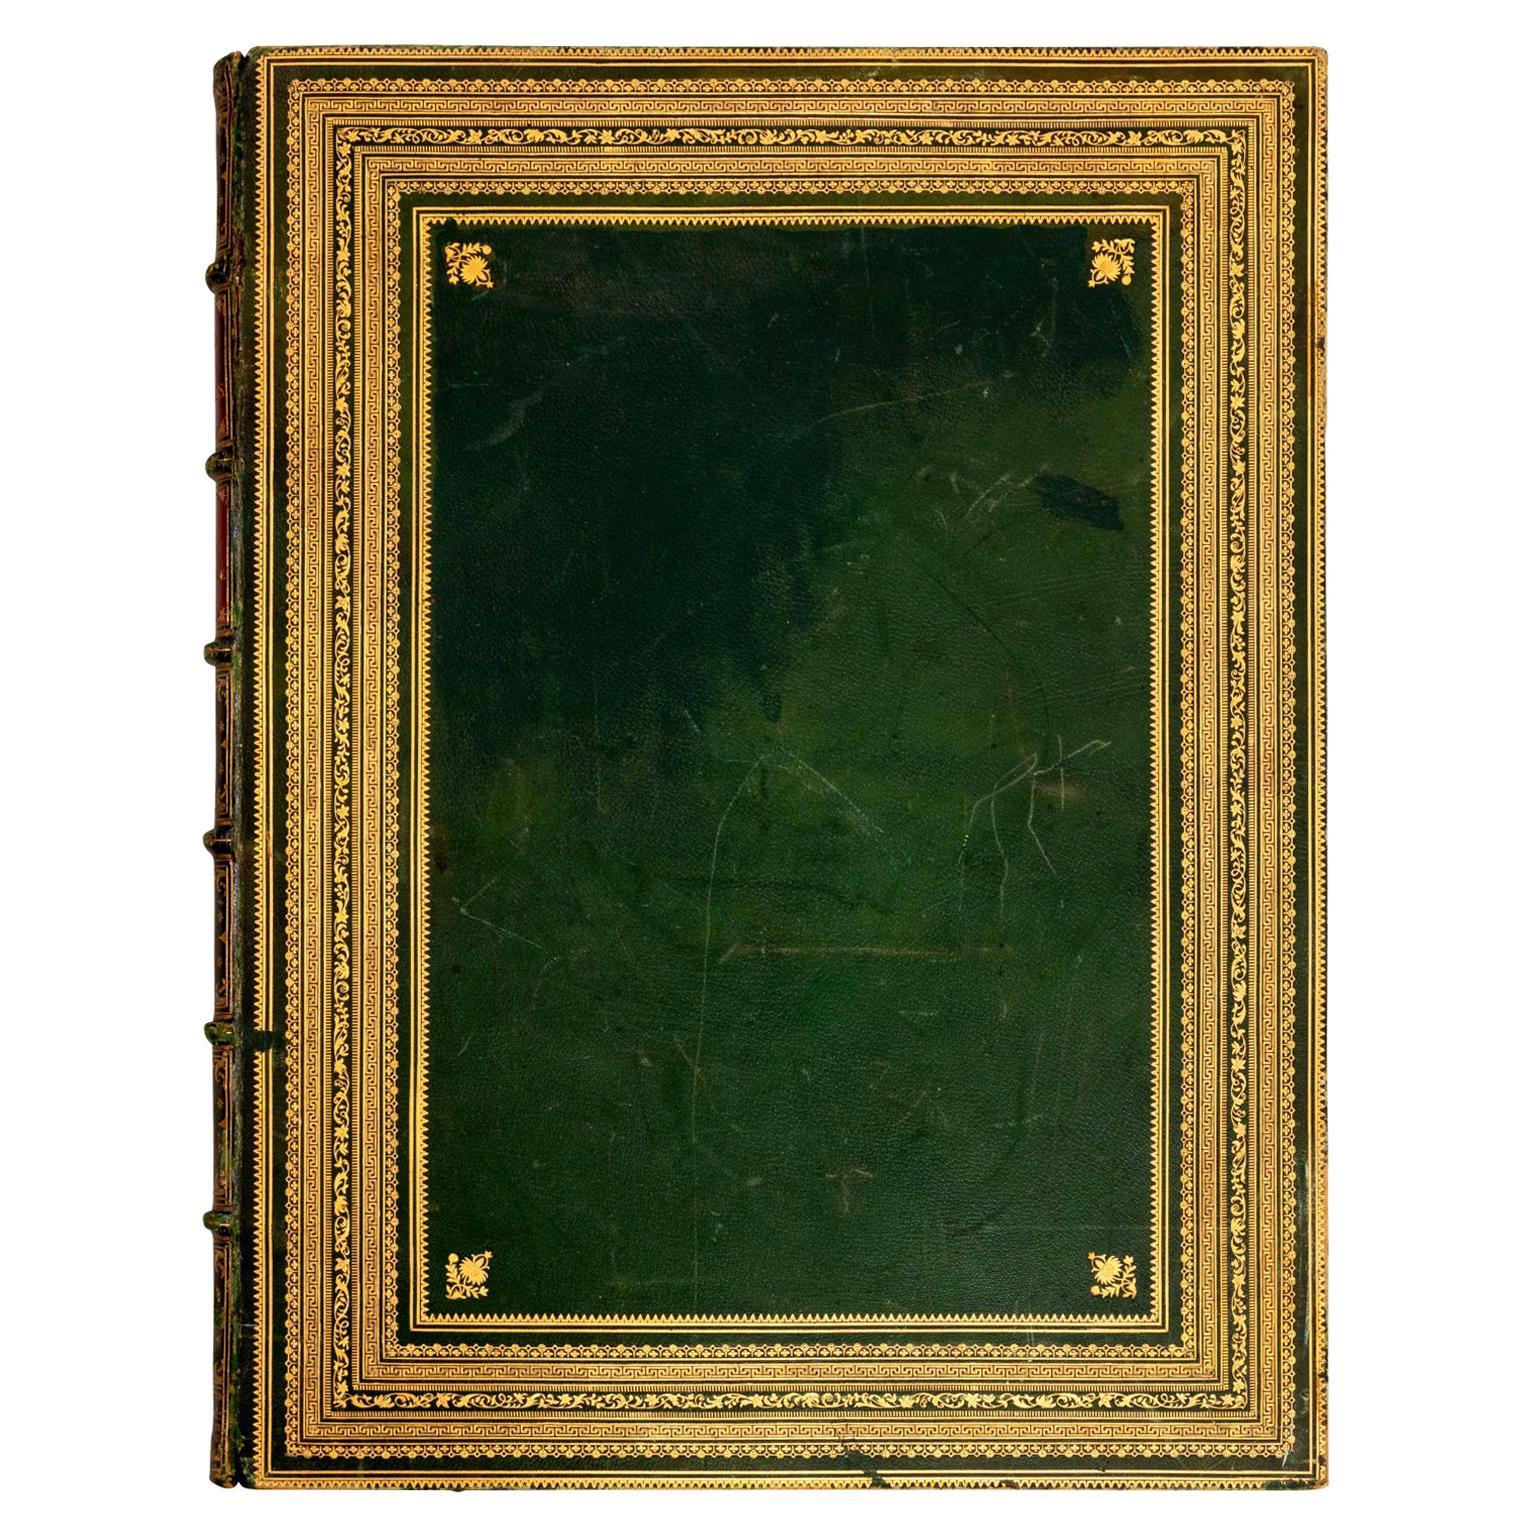 Huge Leatherbound Book Musee Francois Pre 1815 Paris